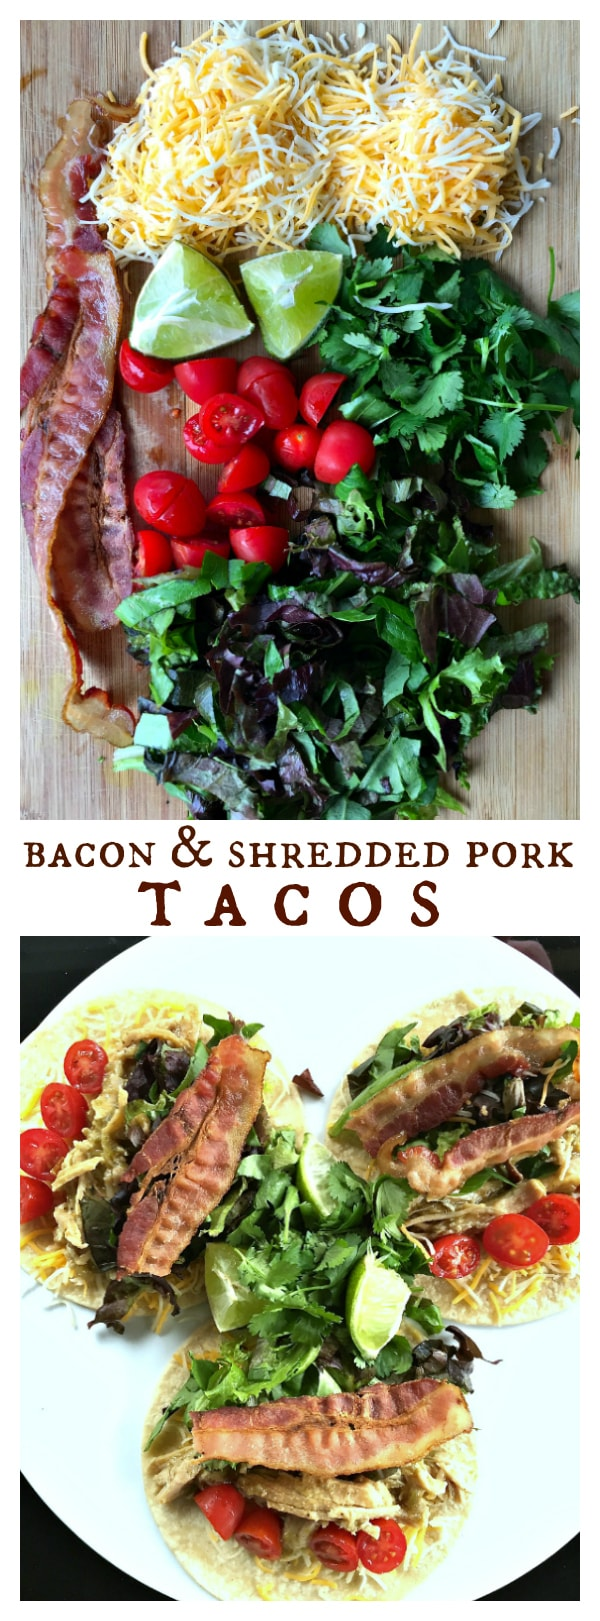 Bacon & Shredded Pork Tacos